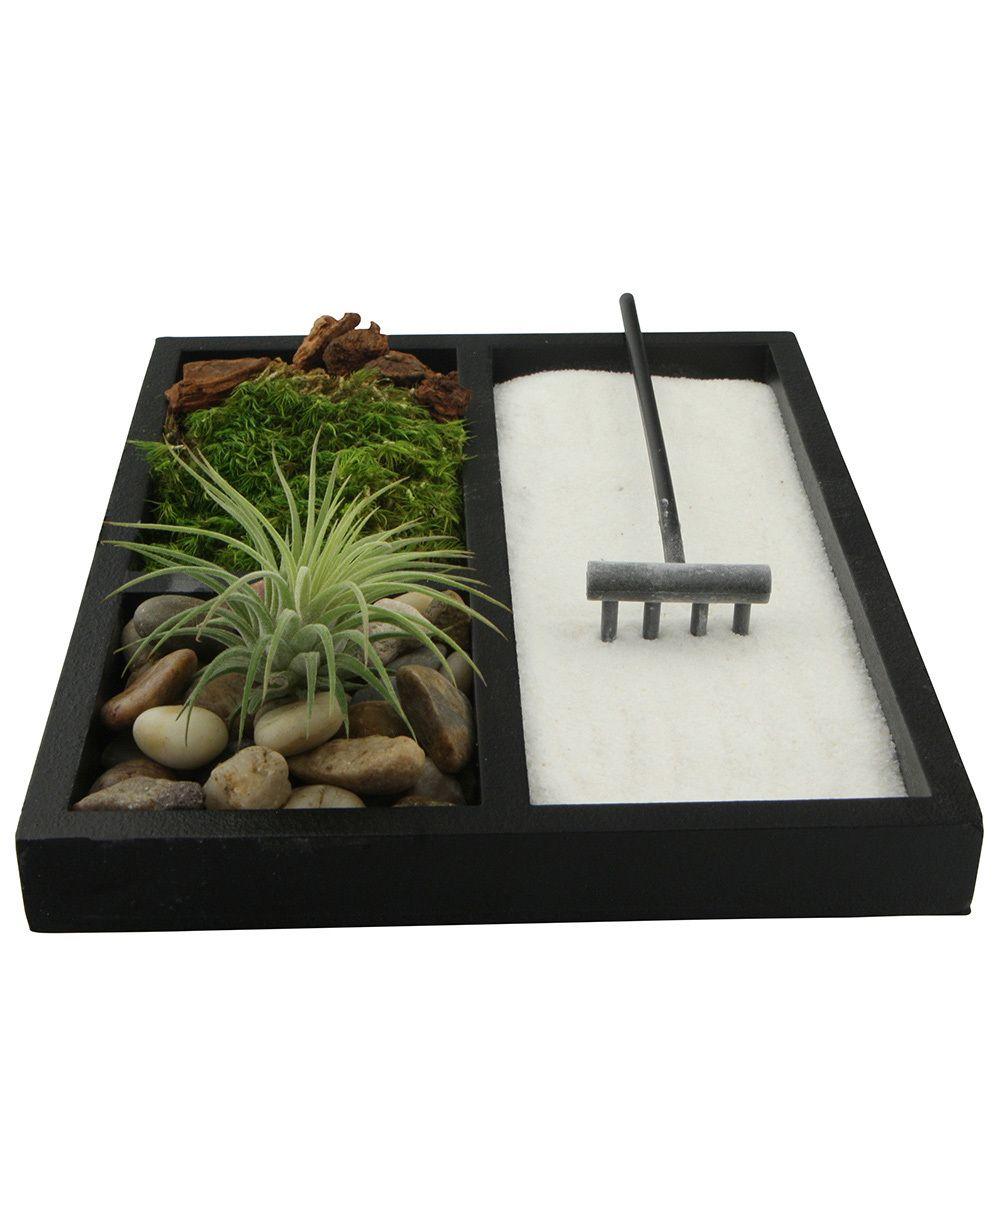 Meditation Zen Garden Terrarium With Natural Elements